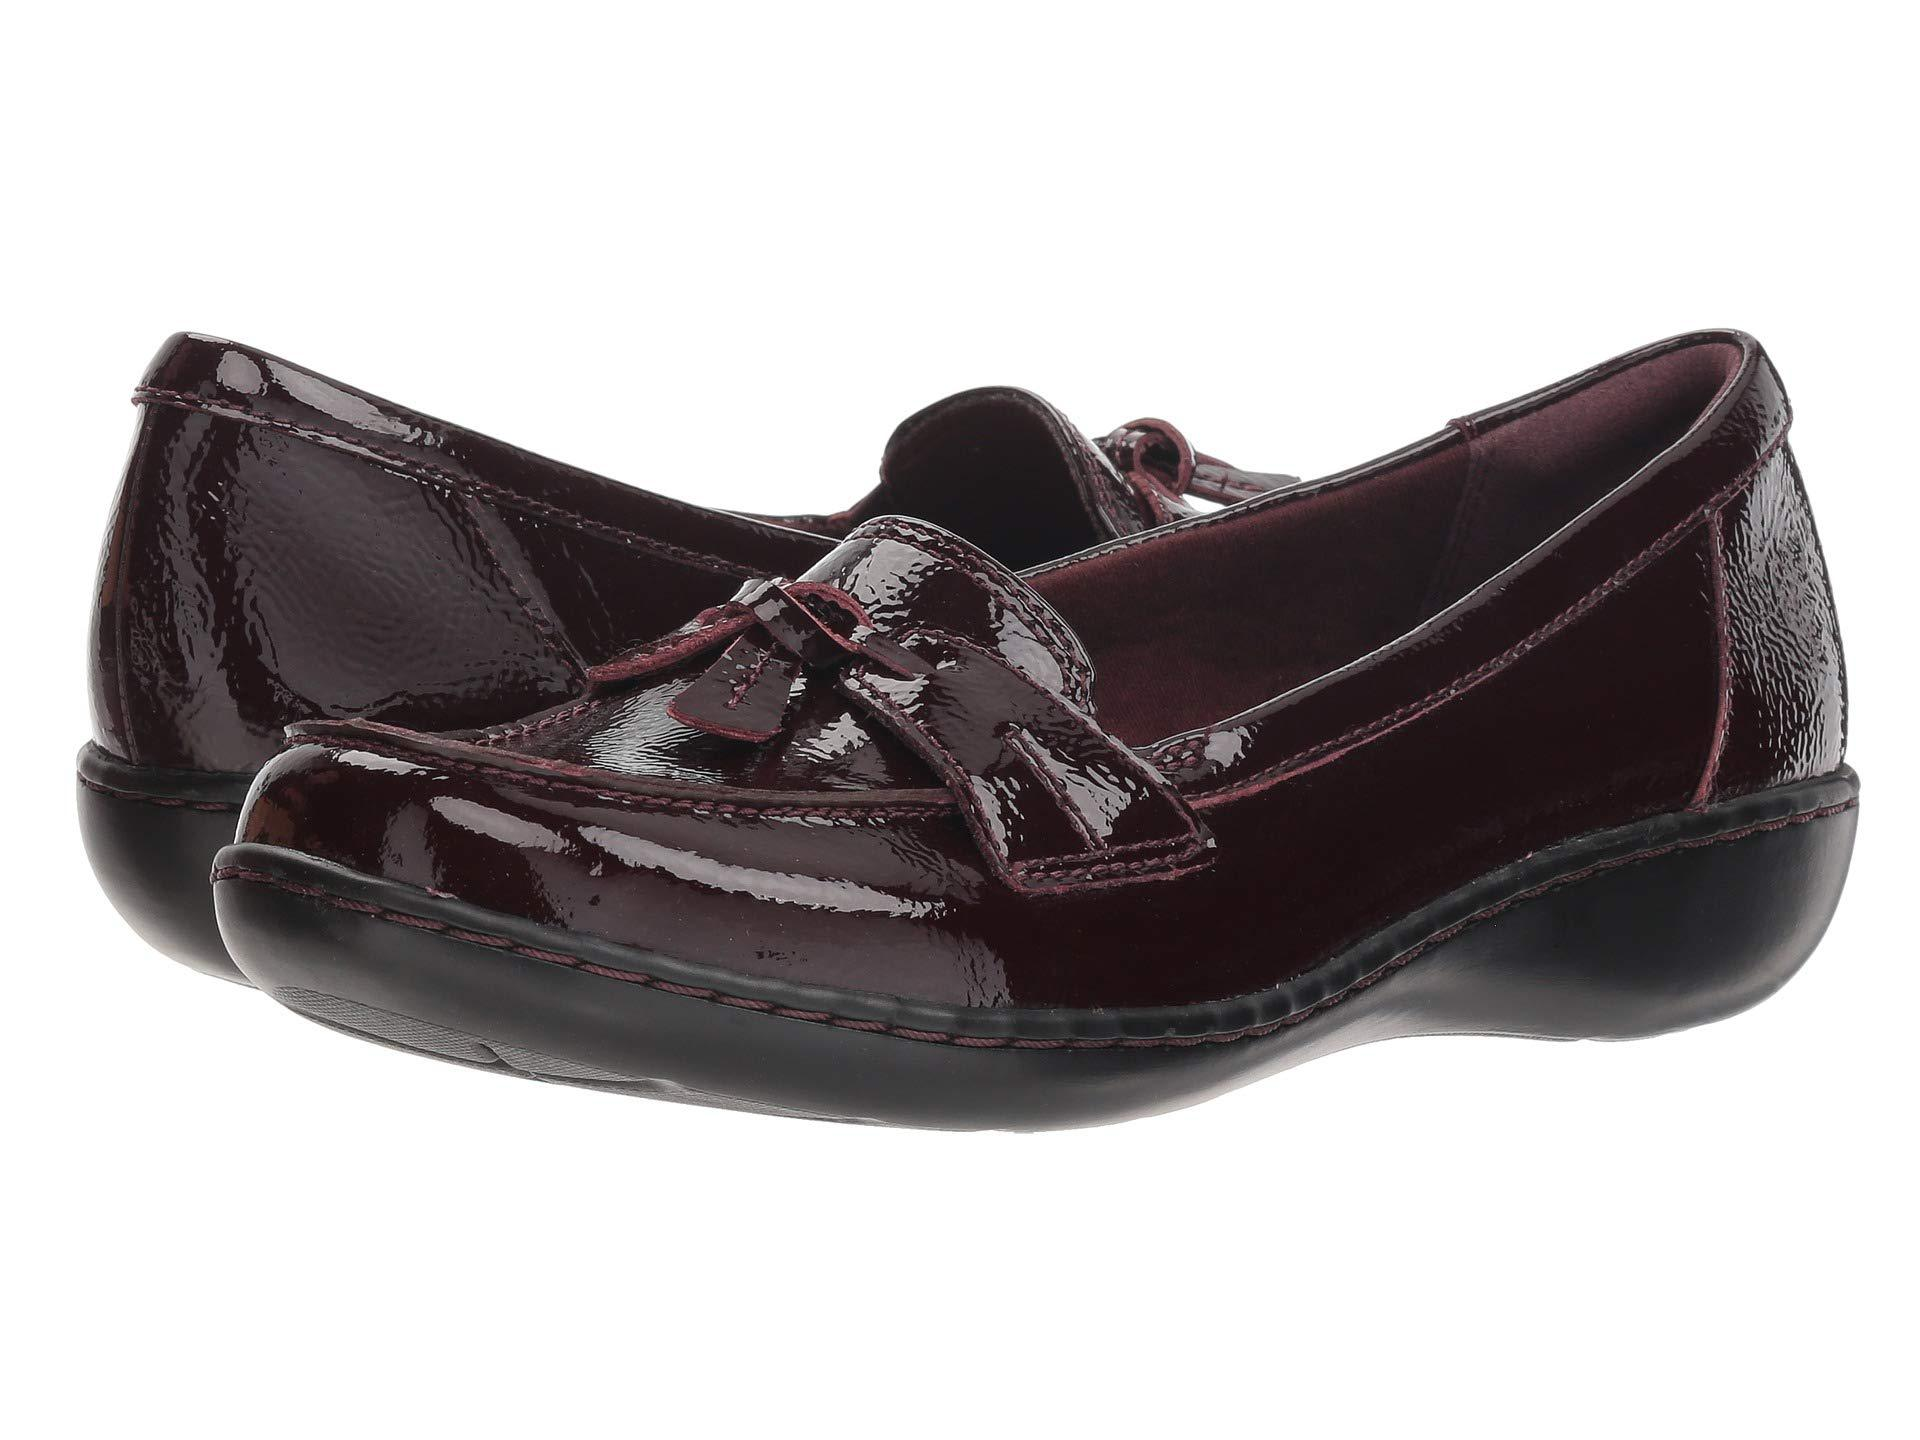 378999d6483 Lyst - Clarks Ashland Bubble (metallic Combo) Women s Slip On Shoes